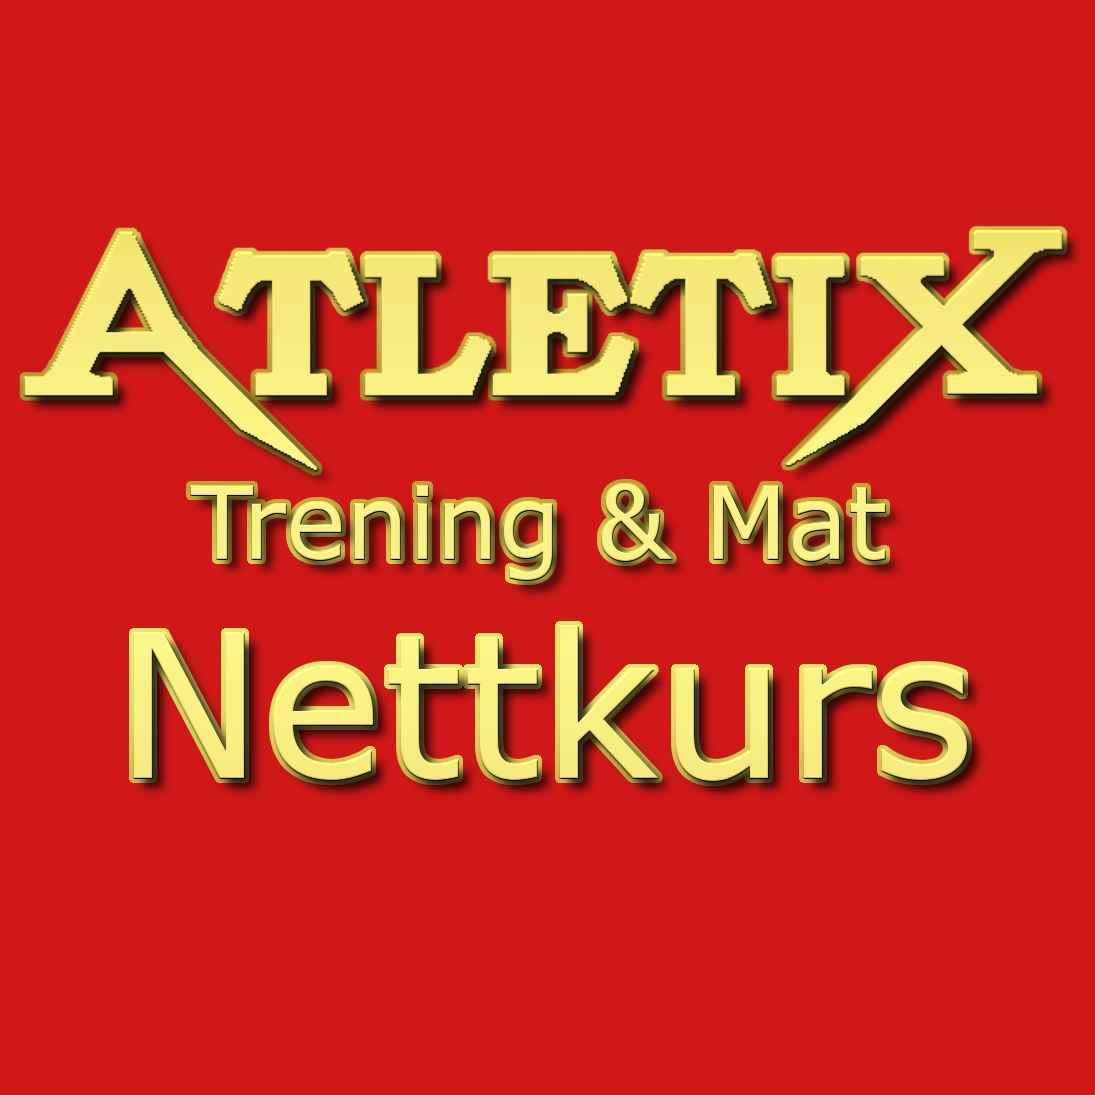 AtletixNettkurs1.jpg